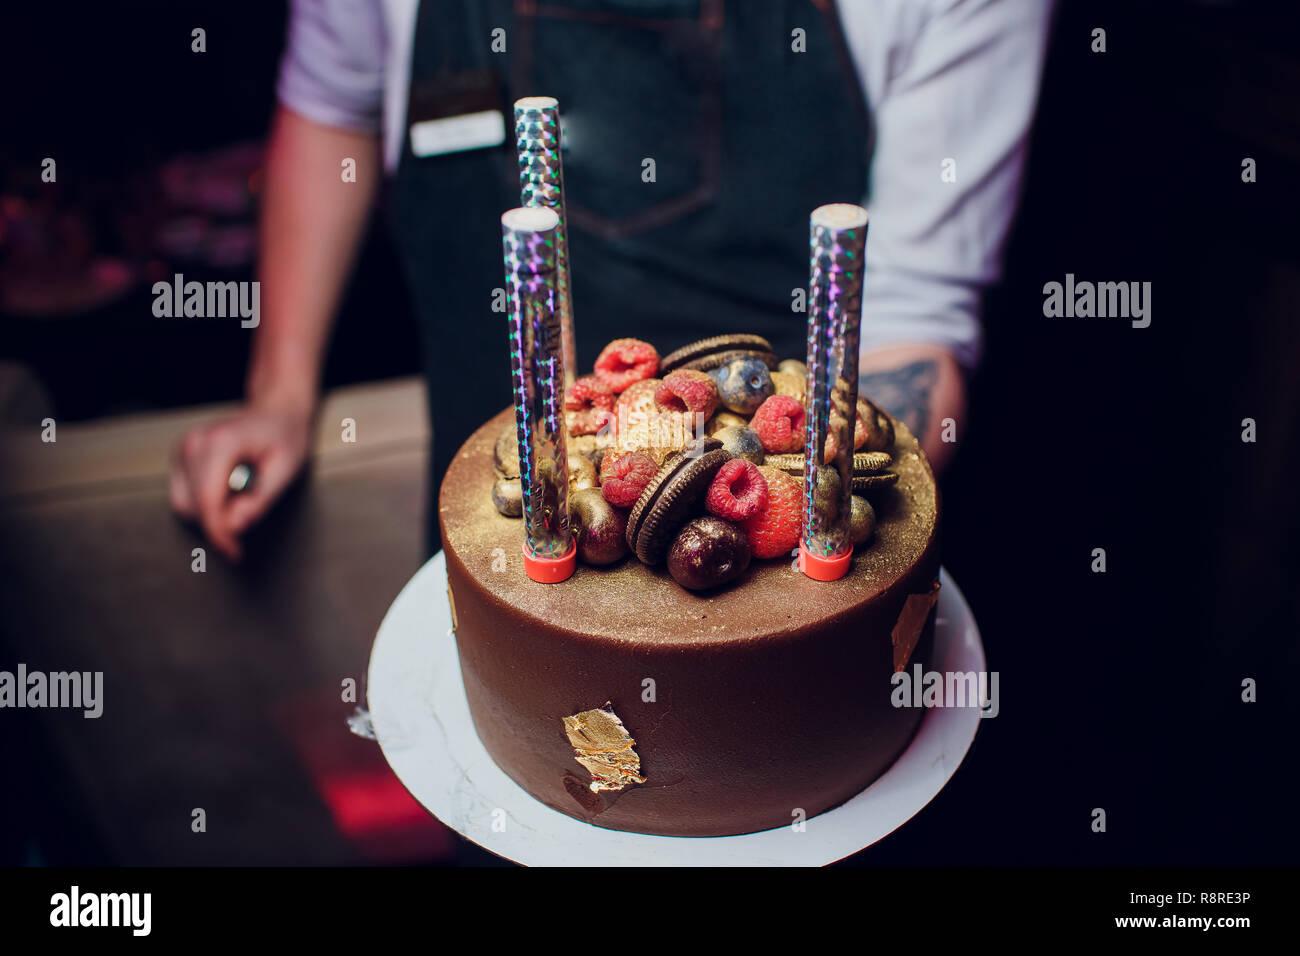 Pleasant Birthday Cake With Fireworks On Table Stock Photo 229168010 Alamy Funny Birthday Cards Online Bapapcheapnameinfo